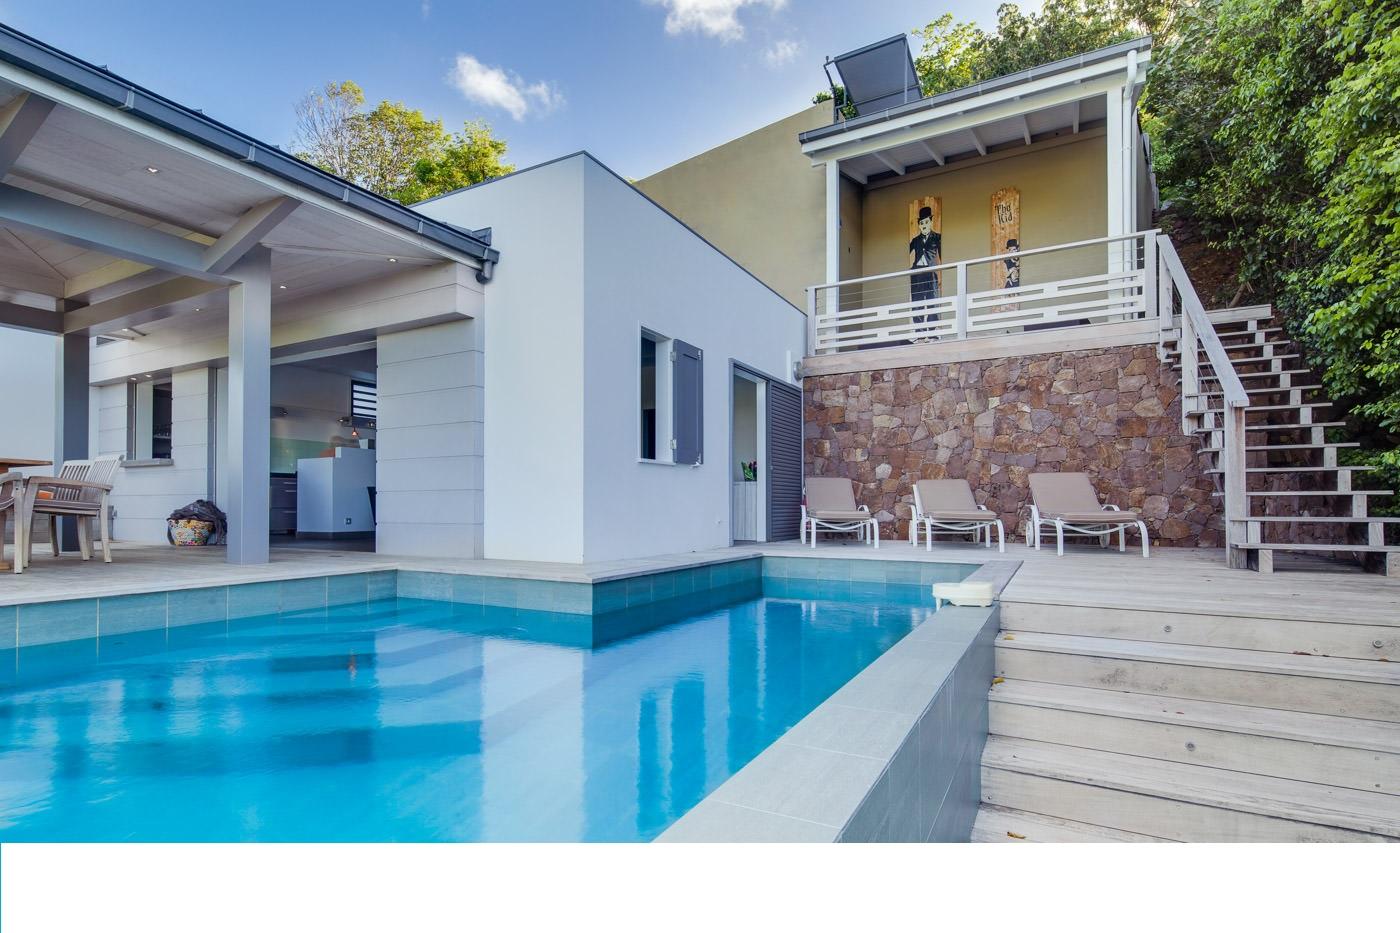 Location vacances st barth l my villa de luxe avec for Villa de vacances avec piscine privee